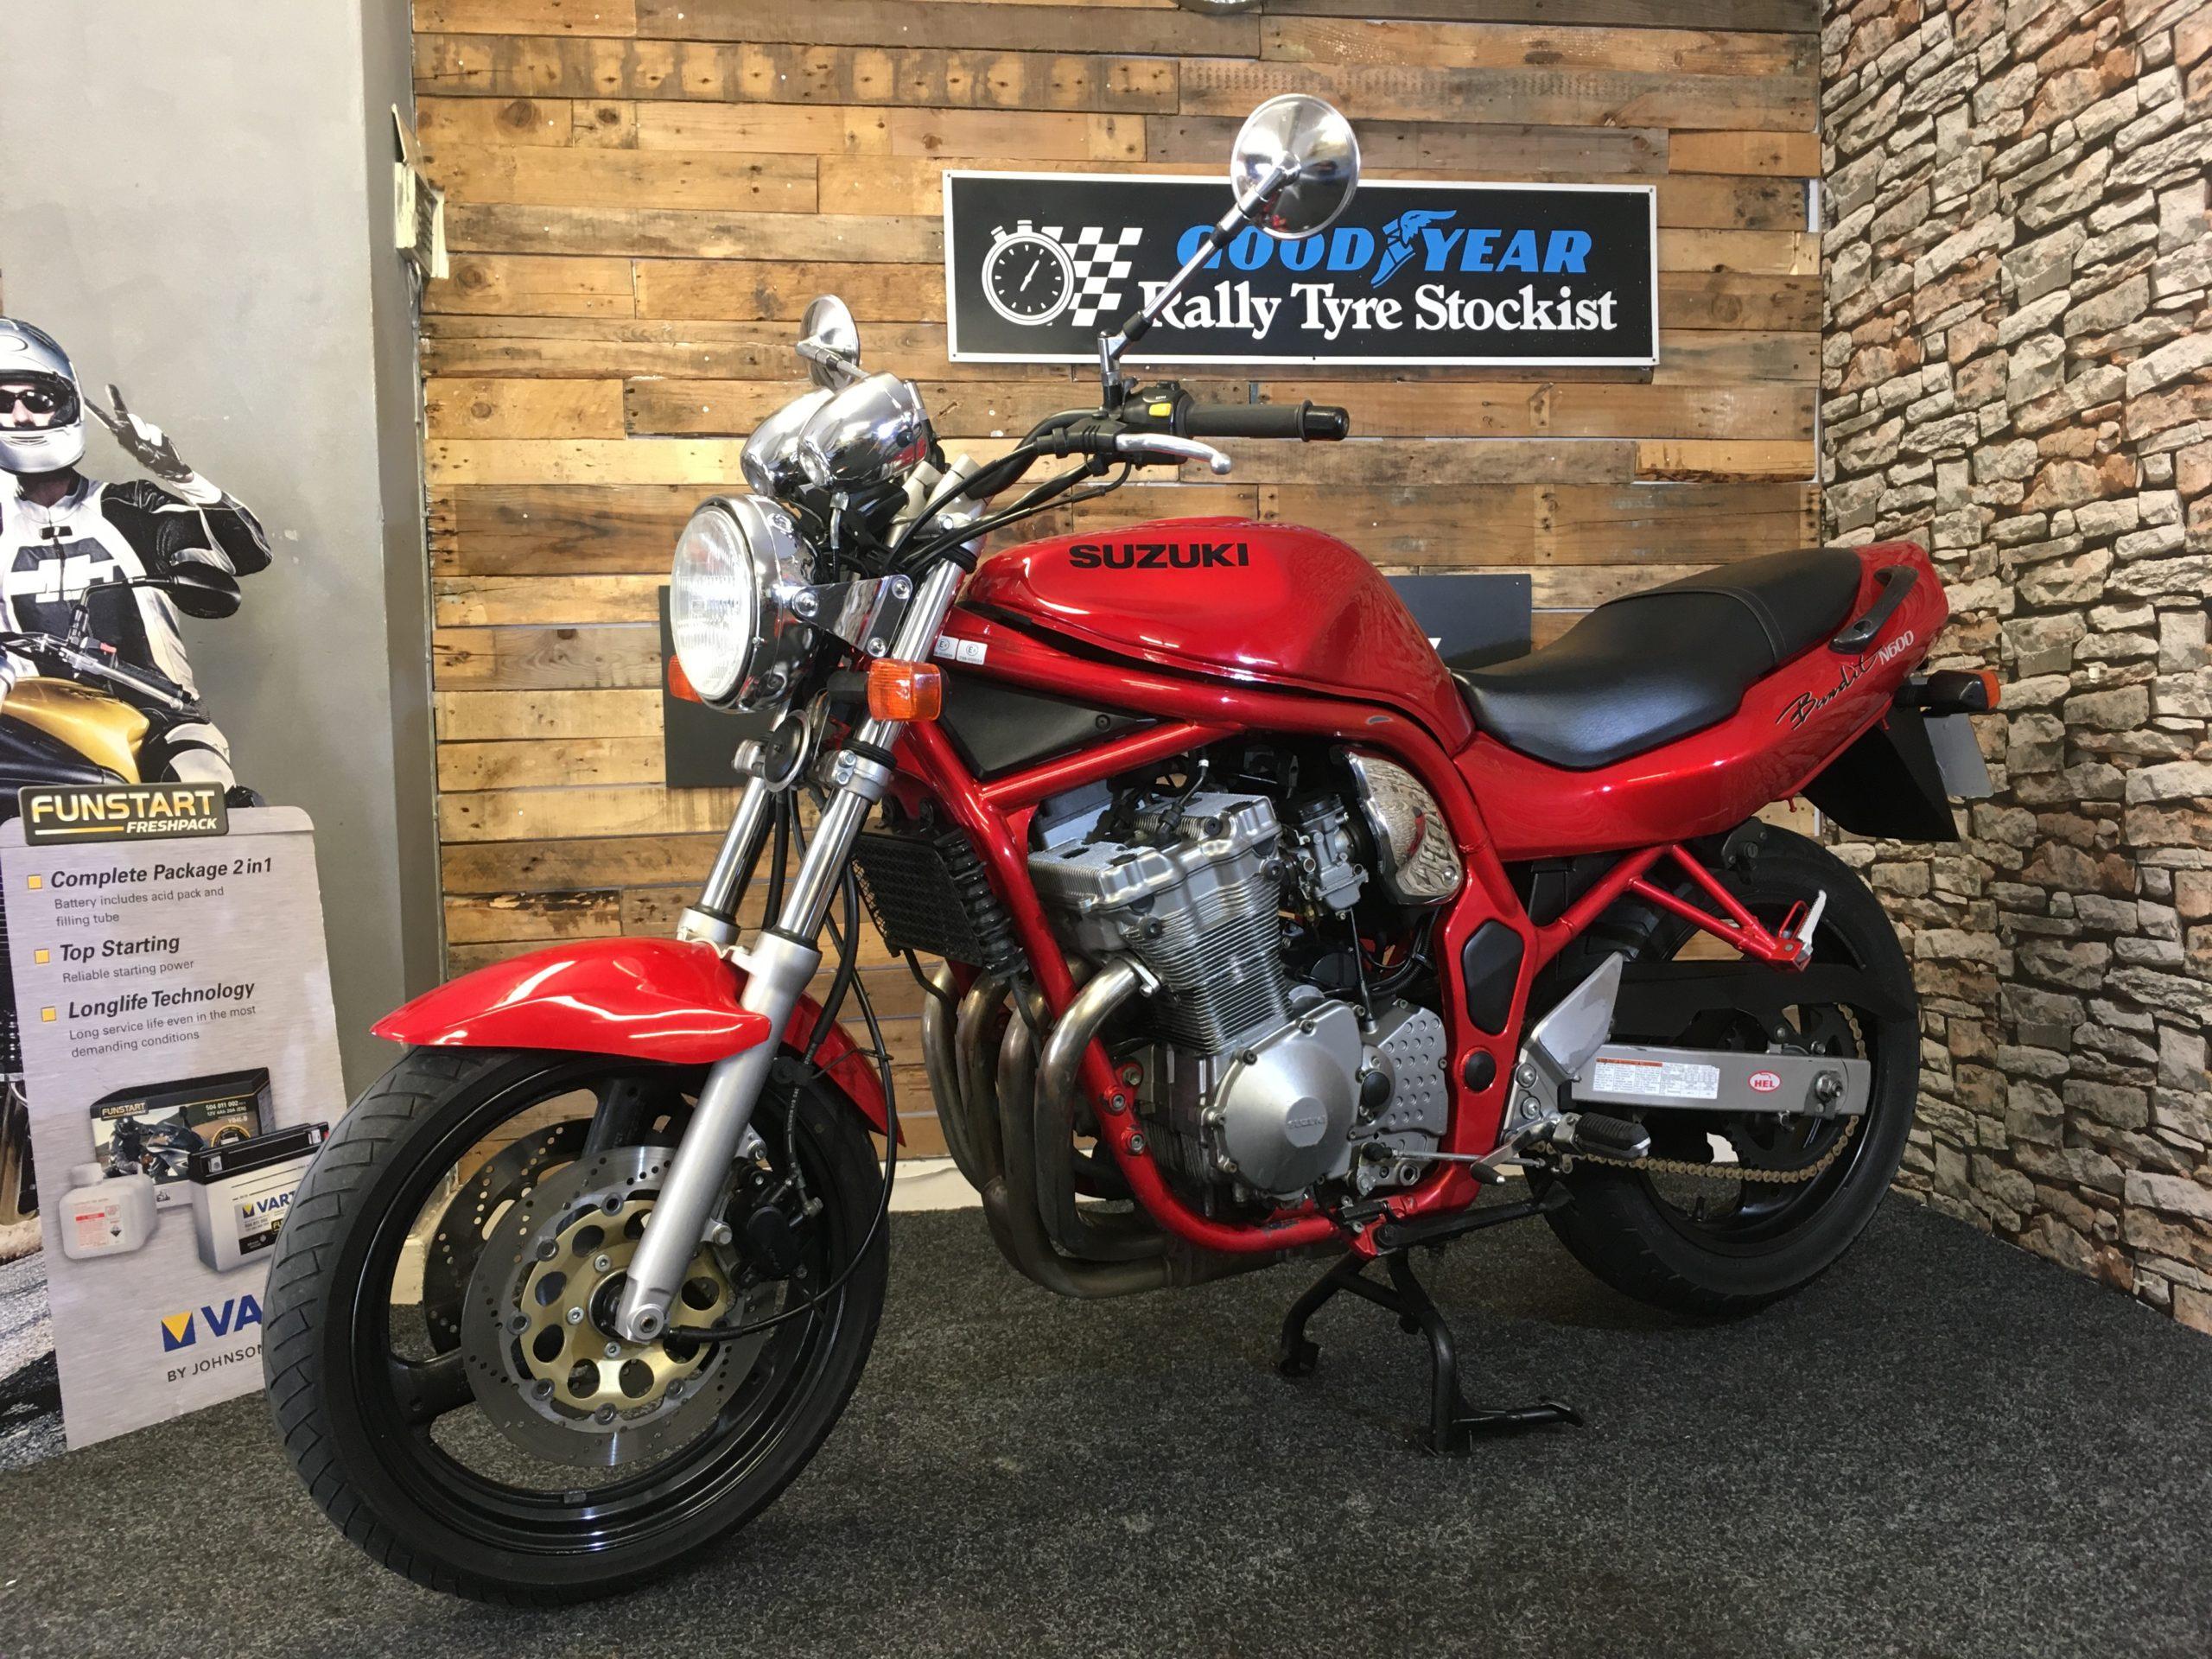 Suzuki Gsf 600 N Bandit Techmoto Motorcycles Sheffield